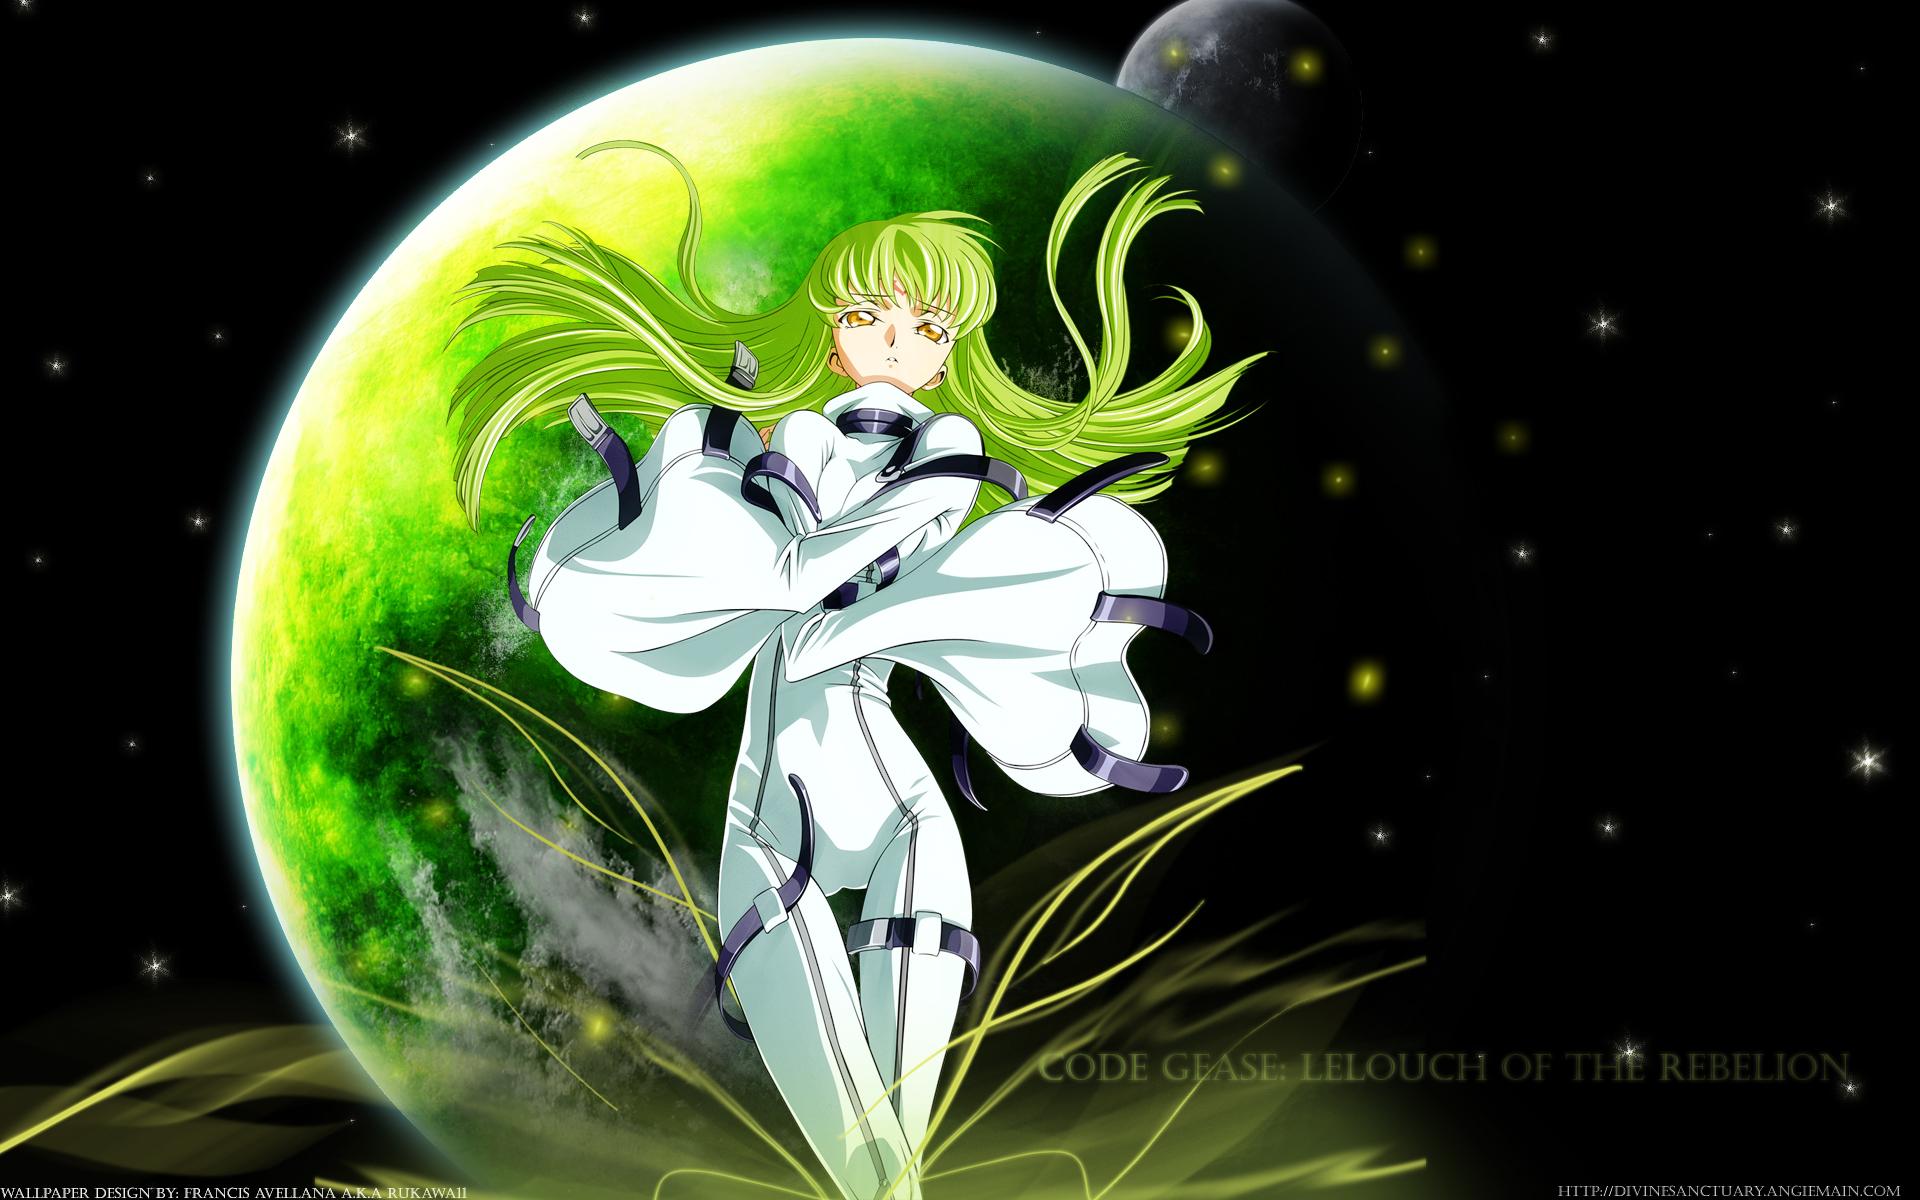 black cc code_geass green_hair long_hair moon planet skintight space stars tagme_(artist) watermark yellow_eyes